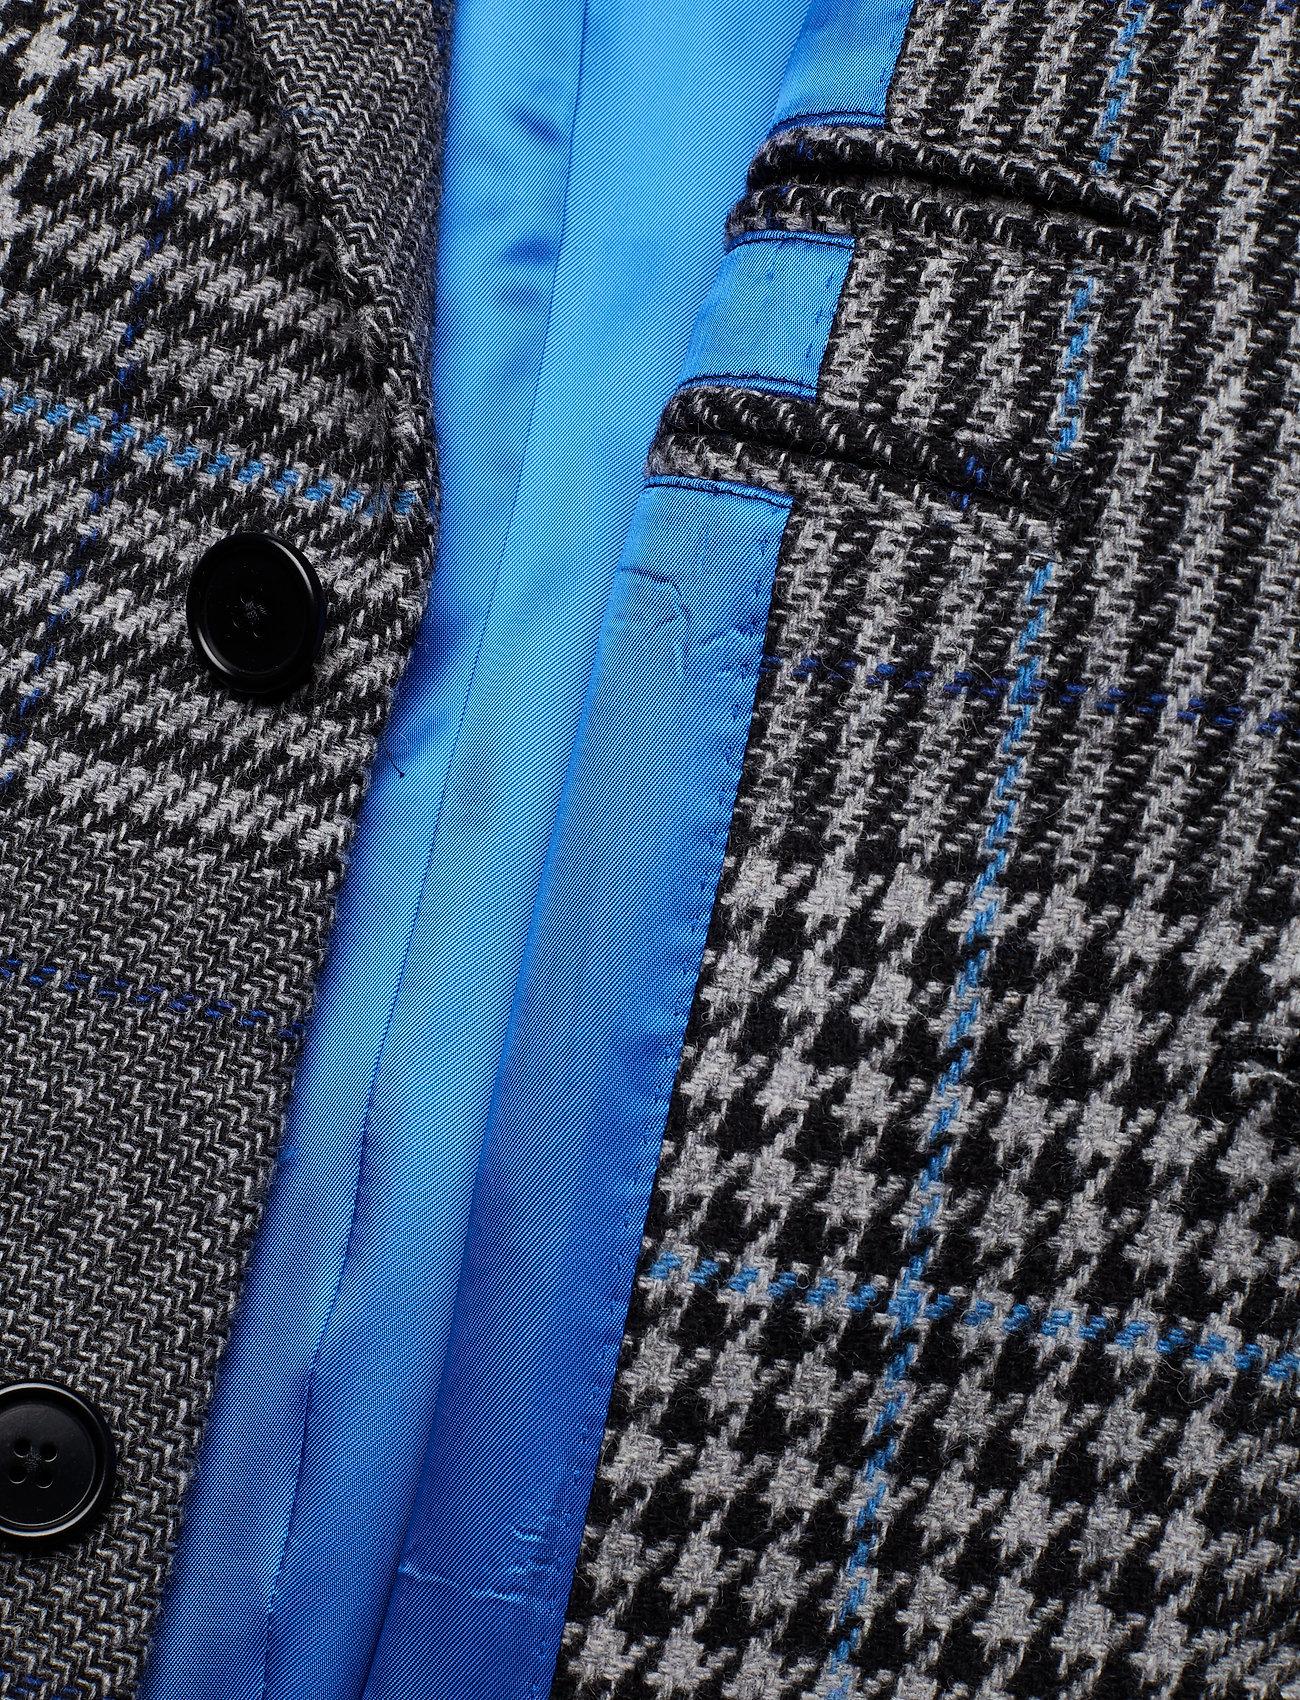 J. Lindeberg James Wool Plaid - Jackor & Rockar Wonder Blue